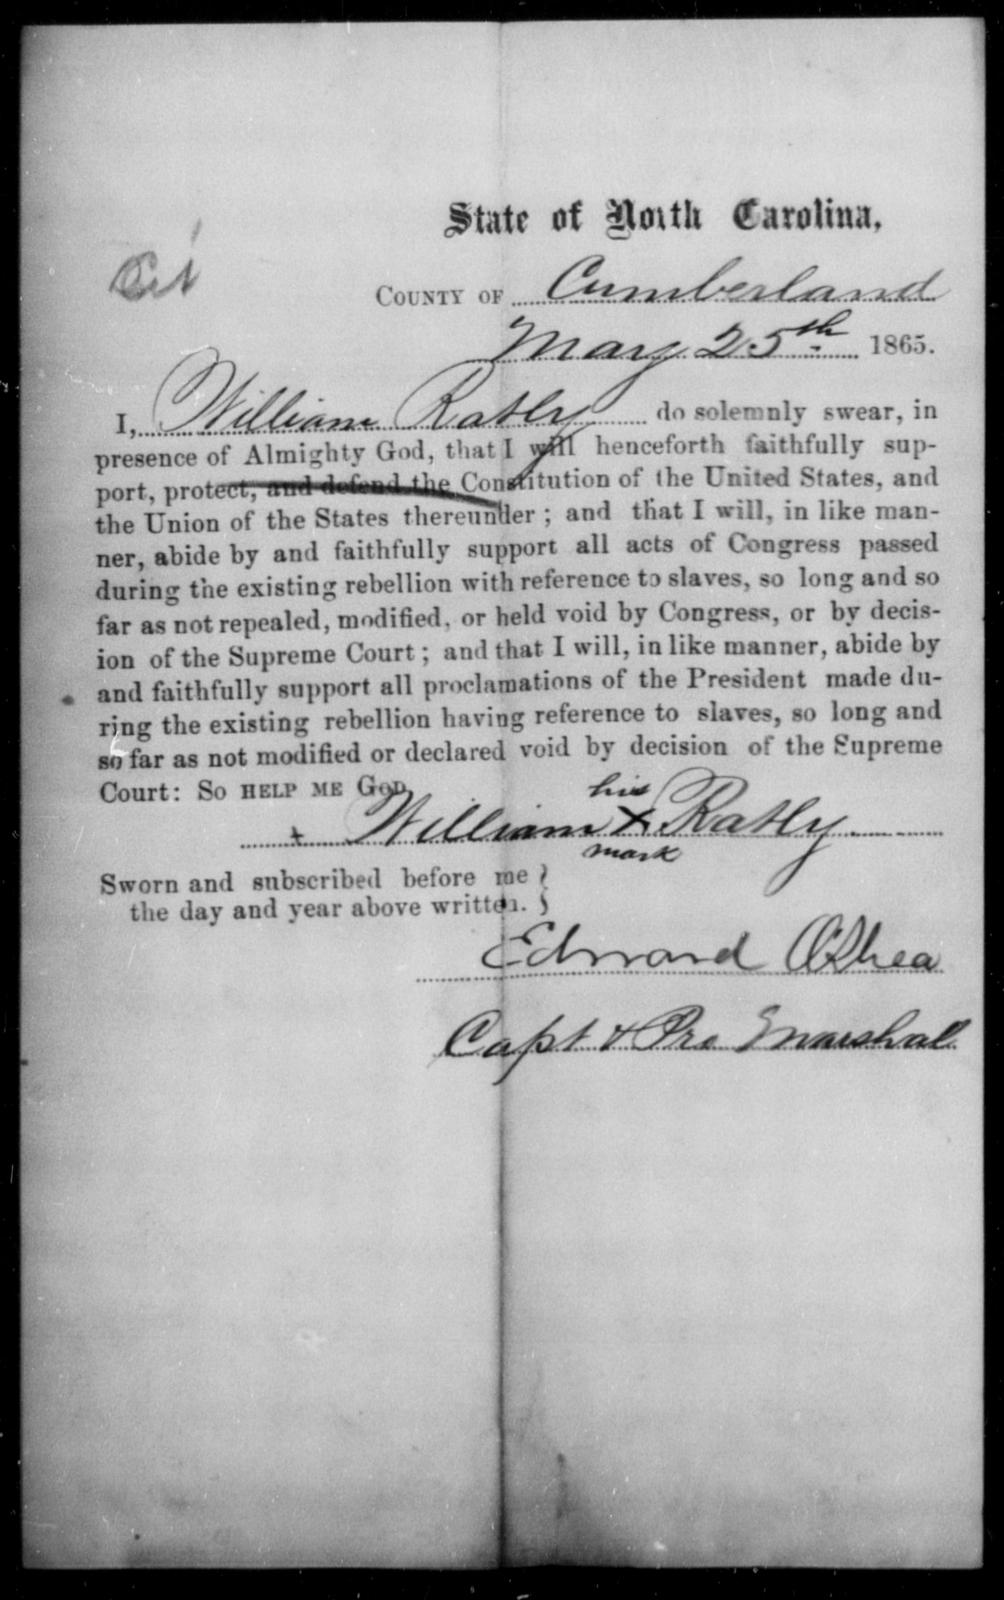 Ratly, William - State: North Carolina - Year: 1865